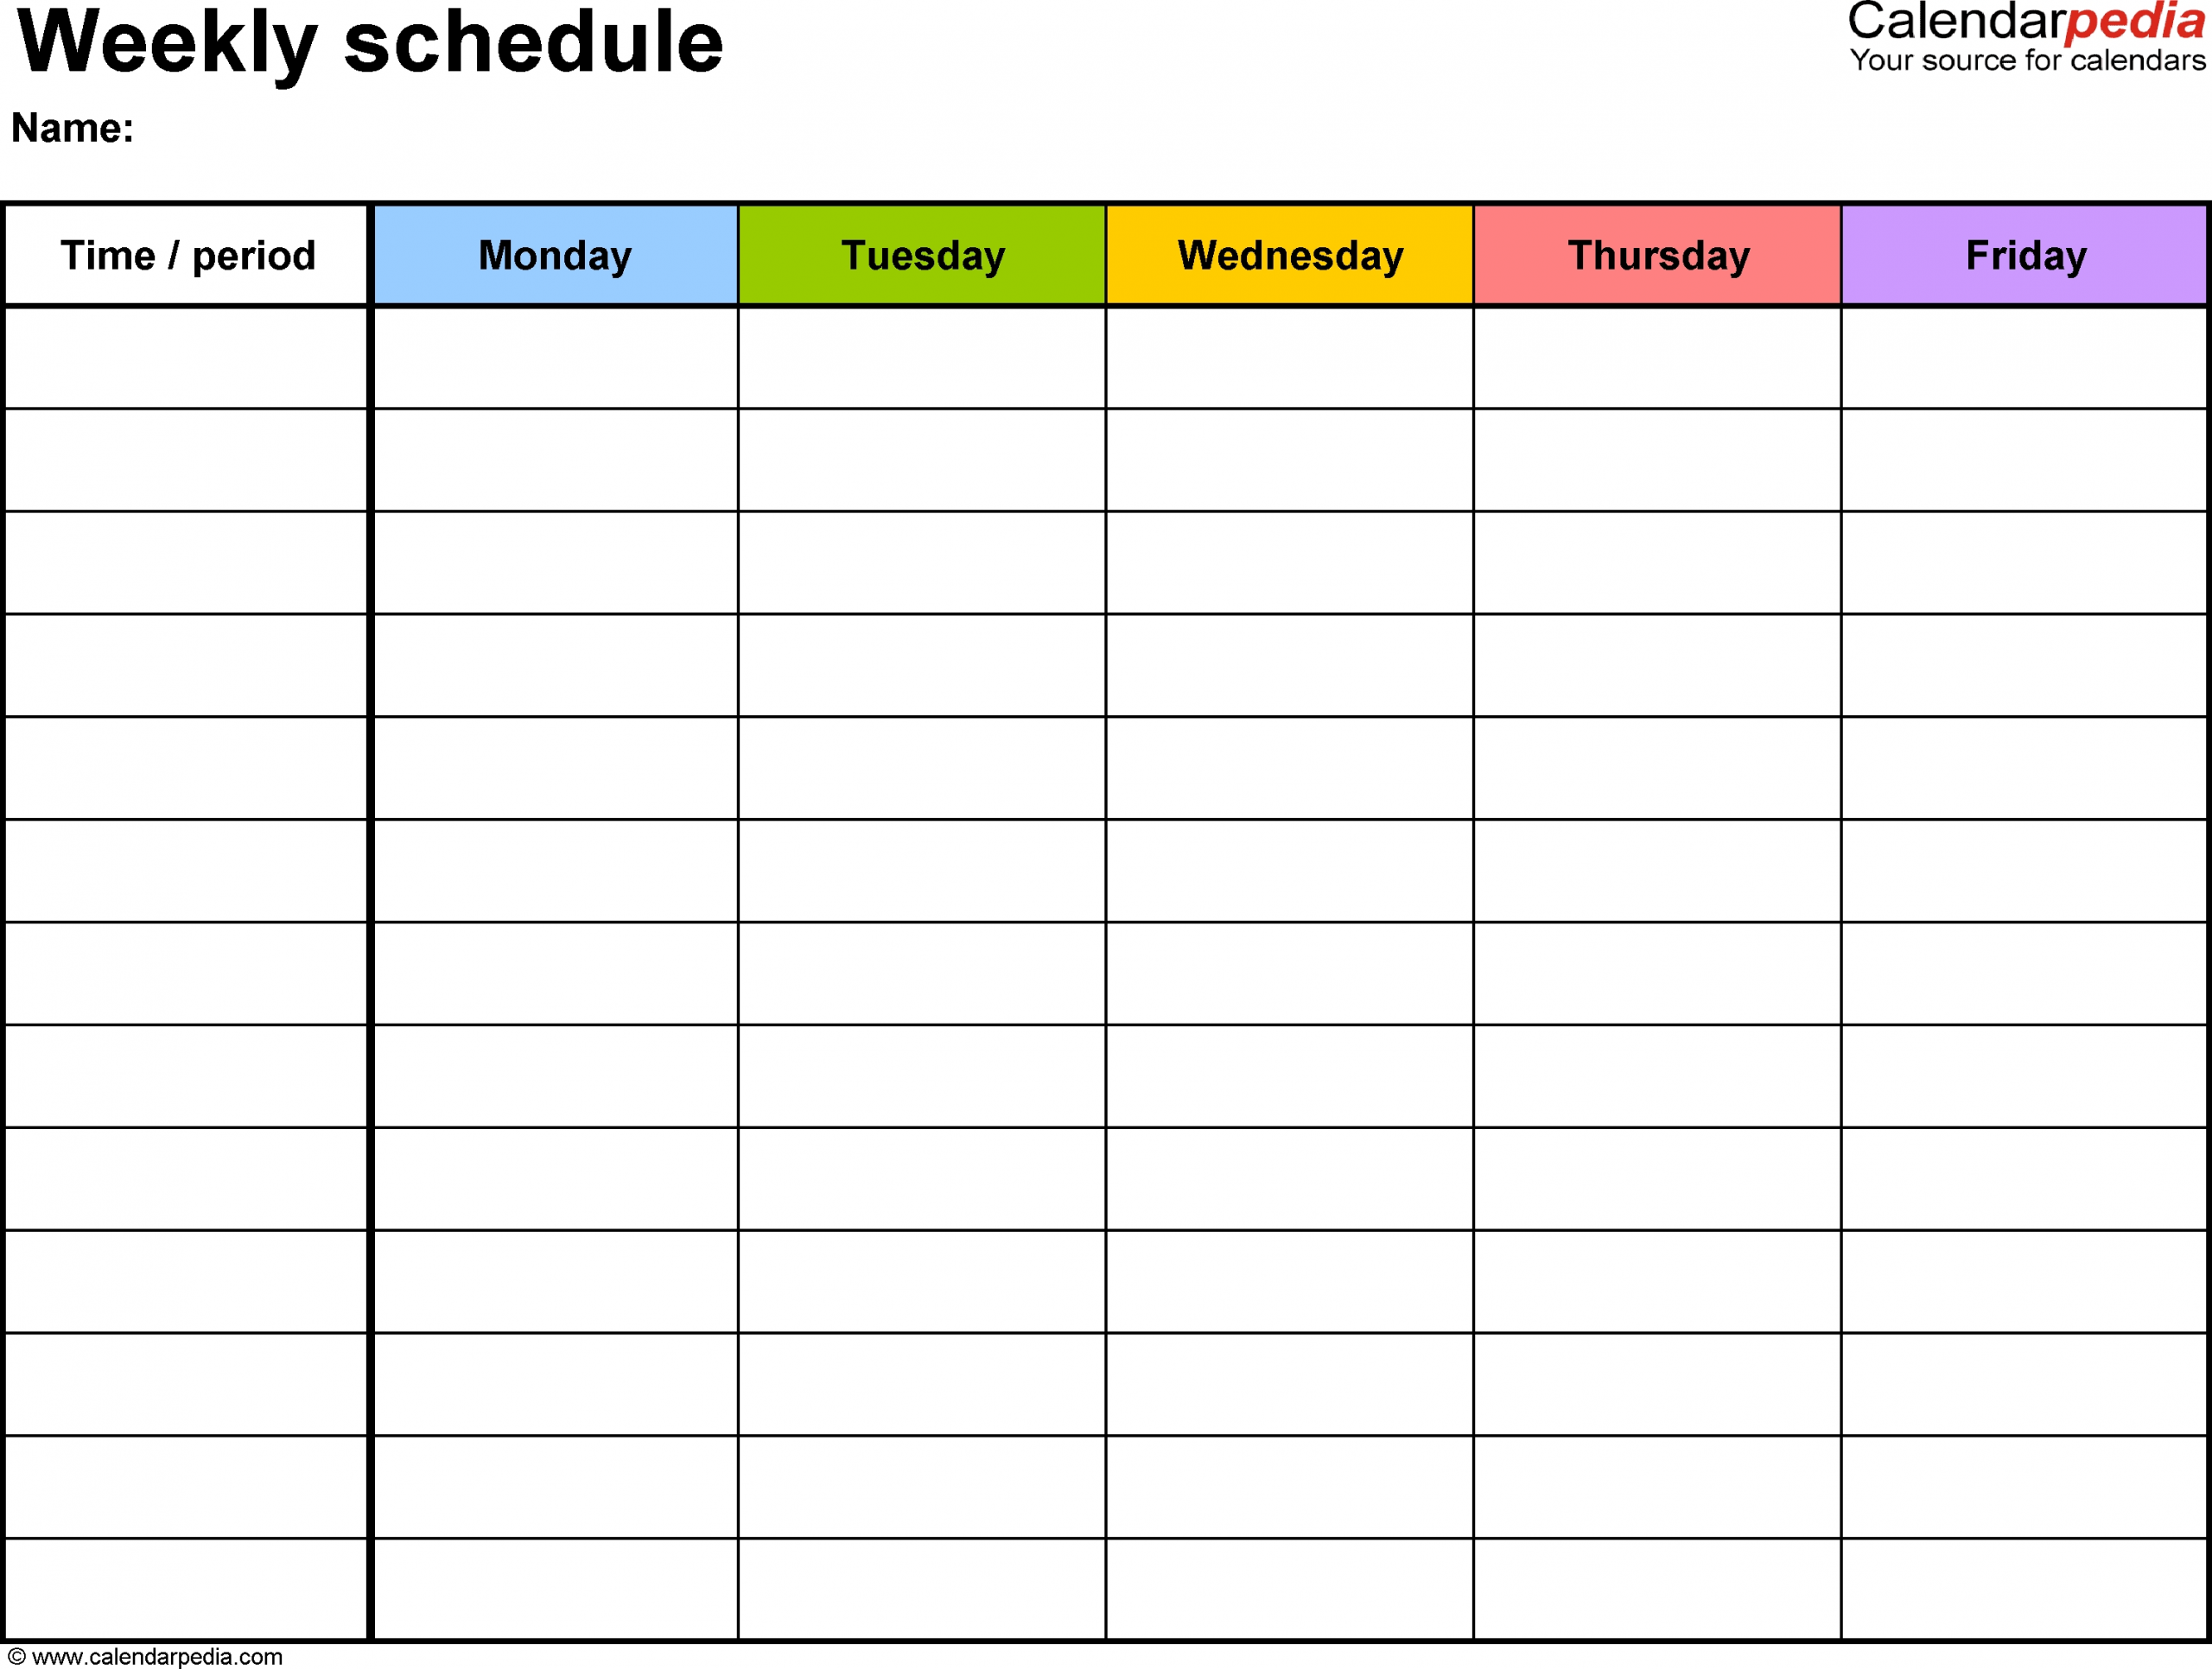 Printable Weekly Calendar | Calendar For Planning